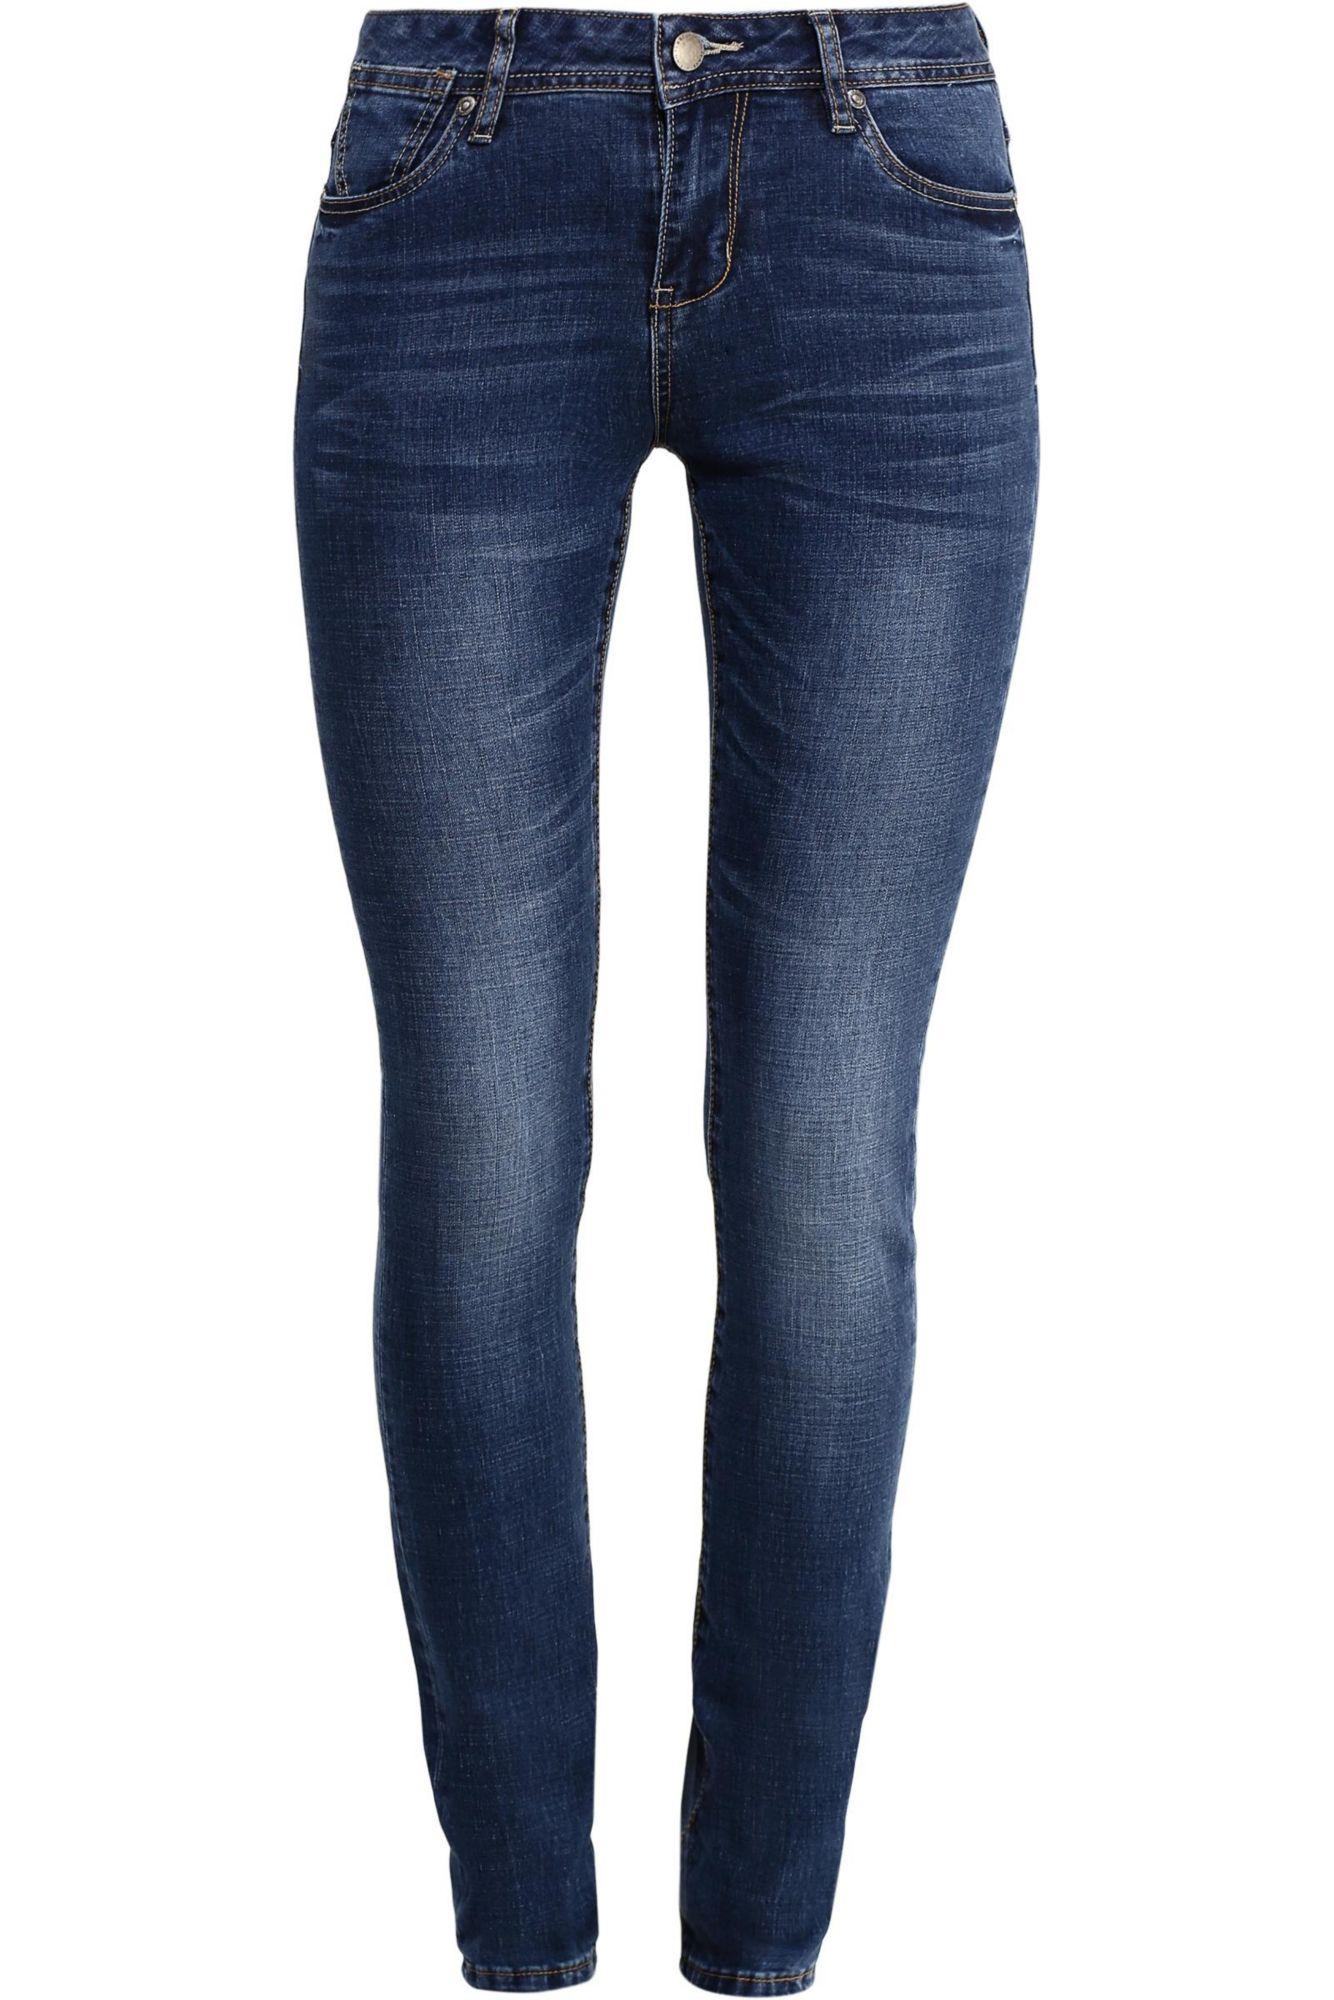 FINN FLARE Finn Flare Jeans